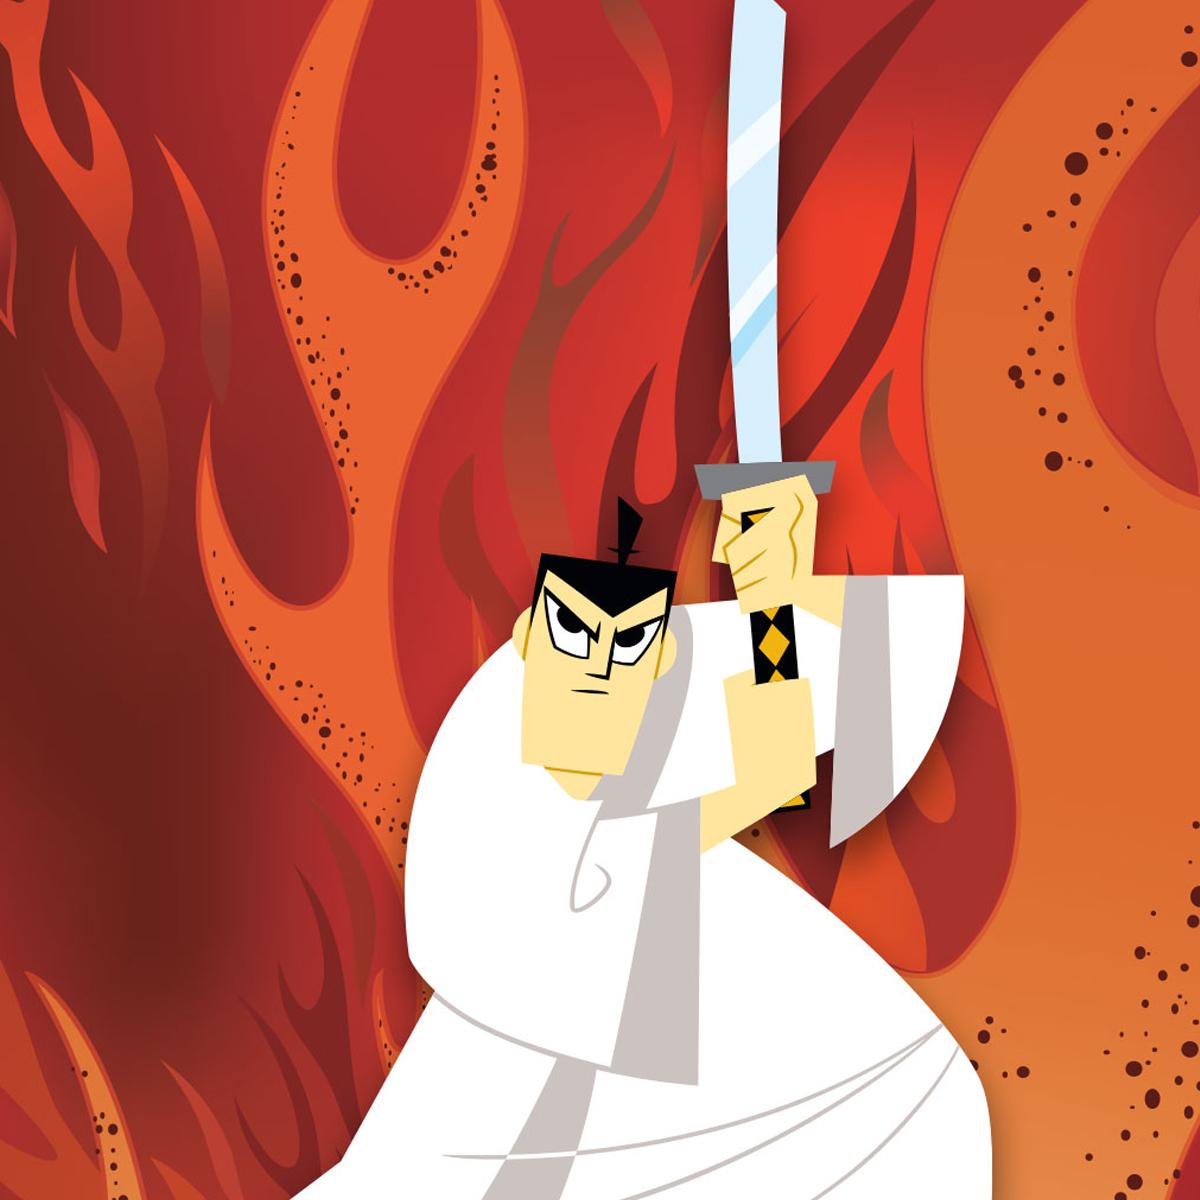 Samurai Jack (Complete Series 1 to 5) FREE @ Adult Swim (Channel 4)